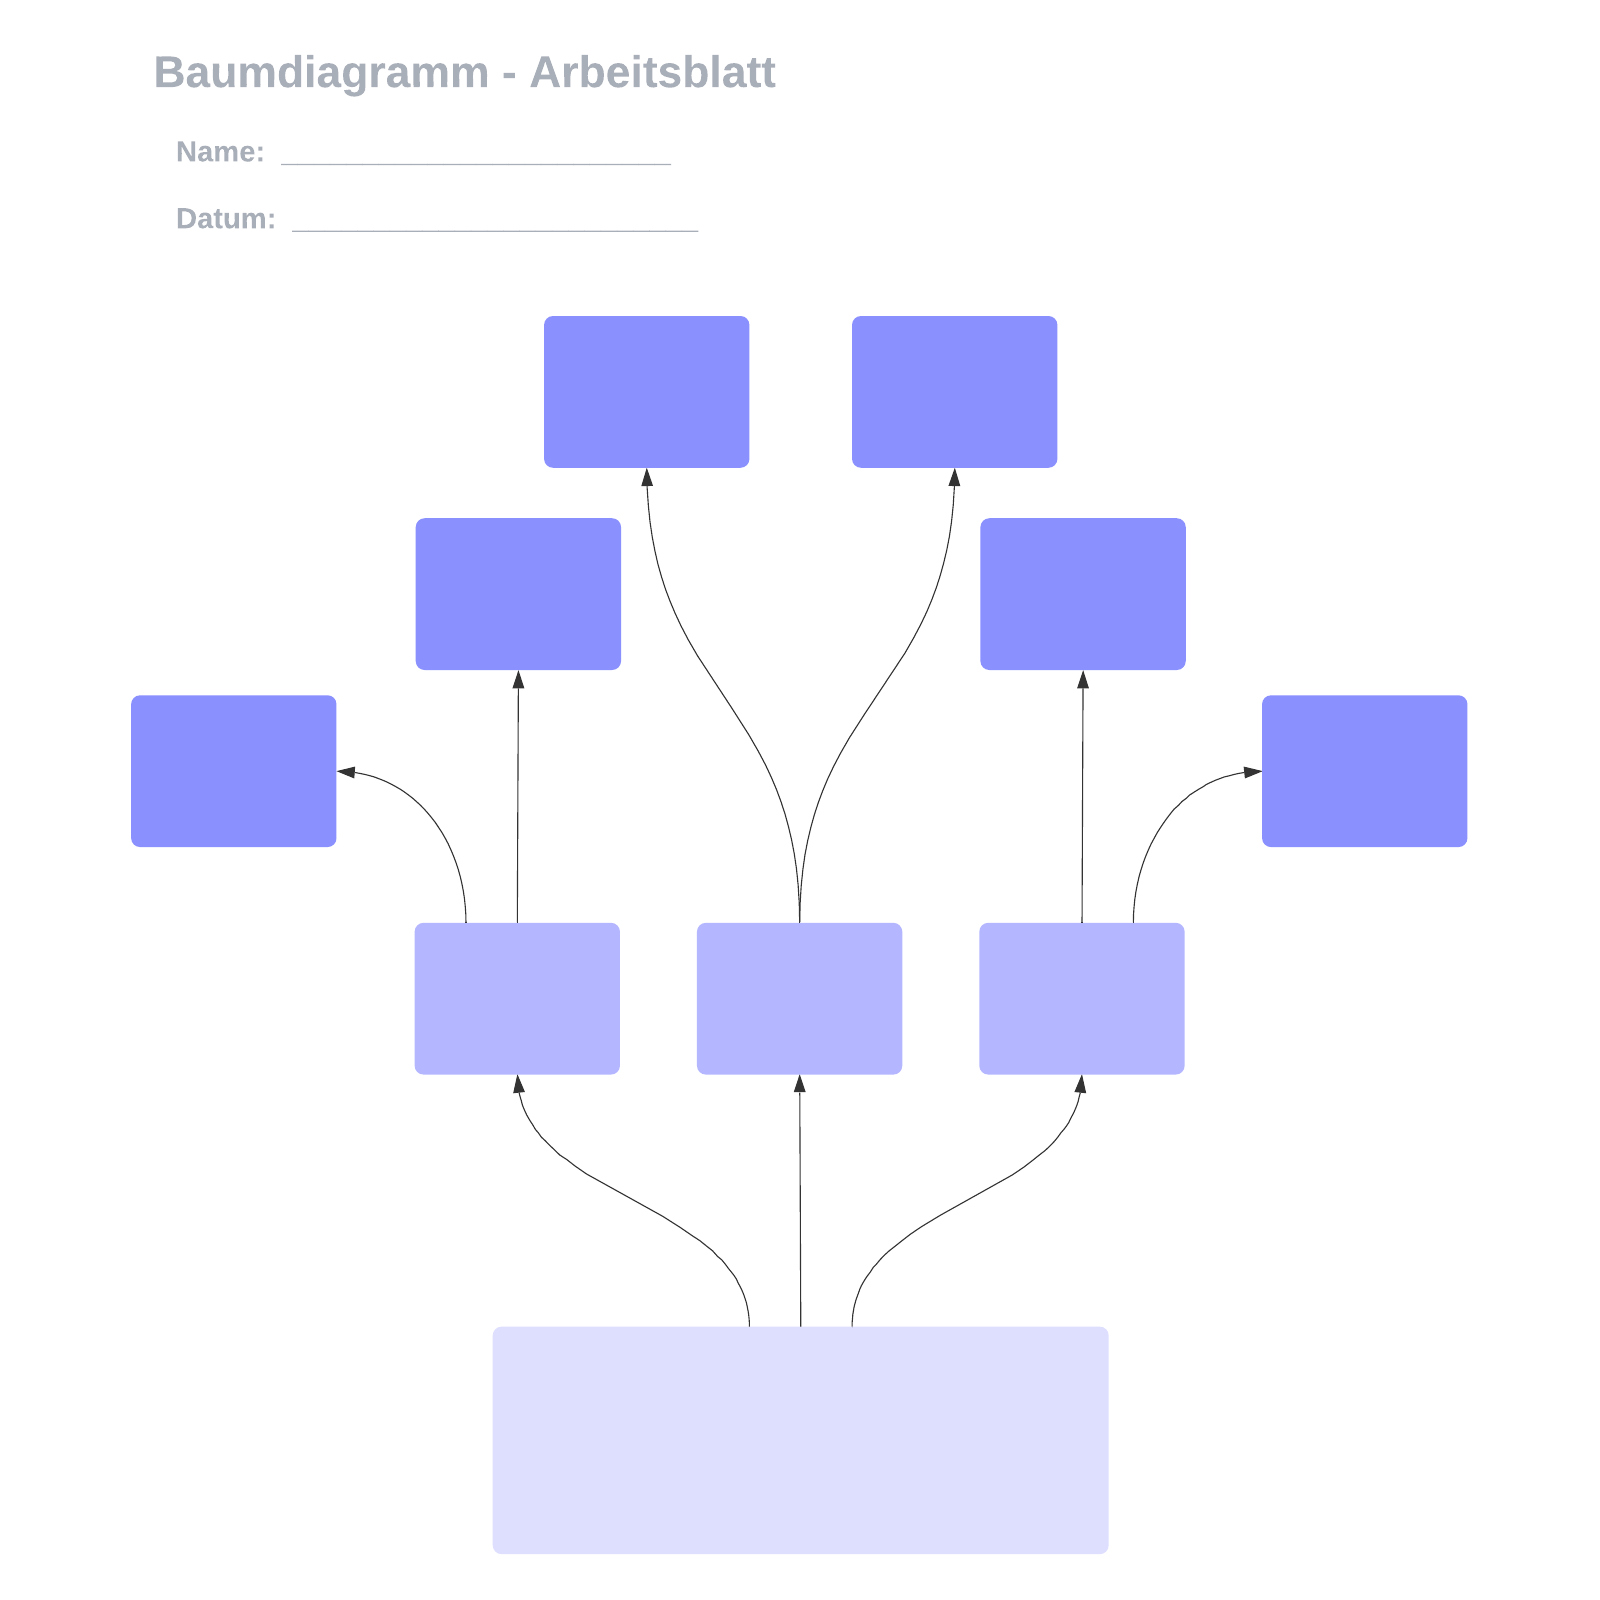 Baumdiagramm - Arbeitsblatt